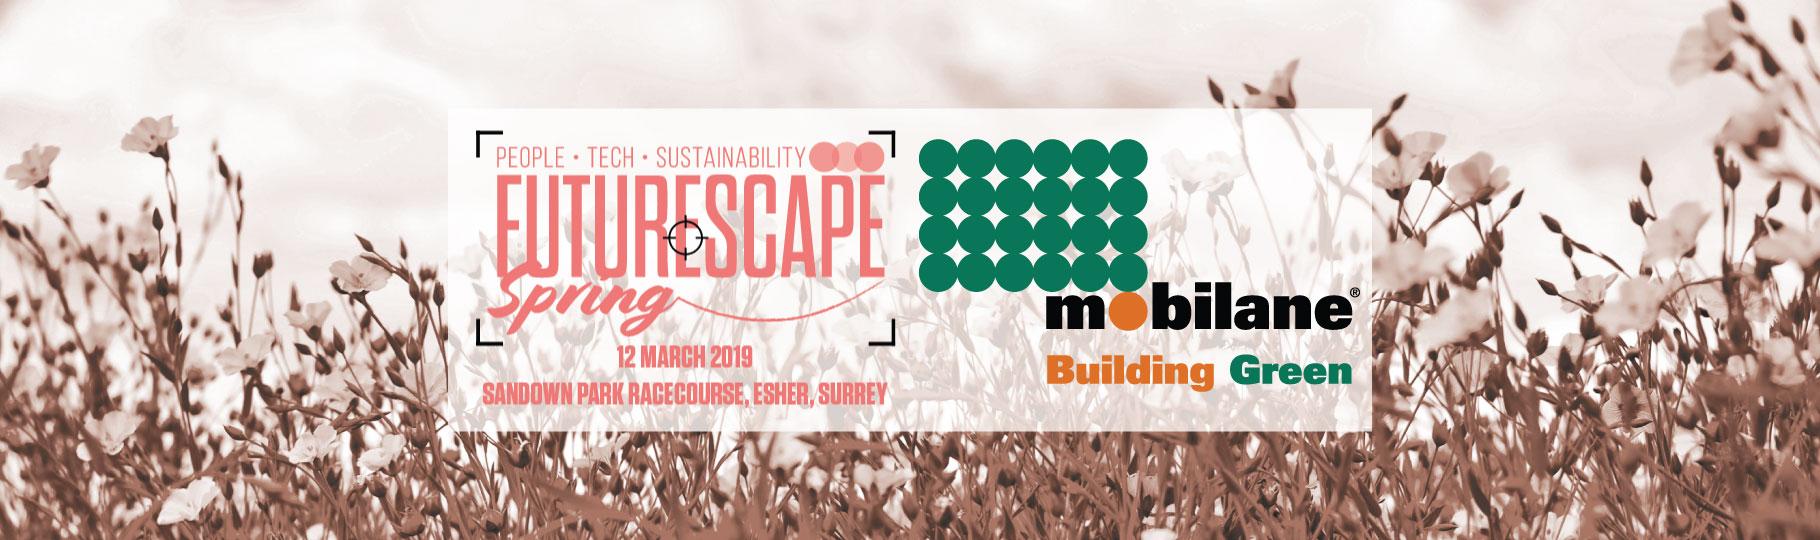 FutureScape Spring Mobilane HEader